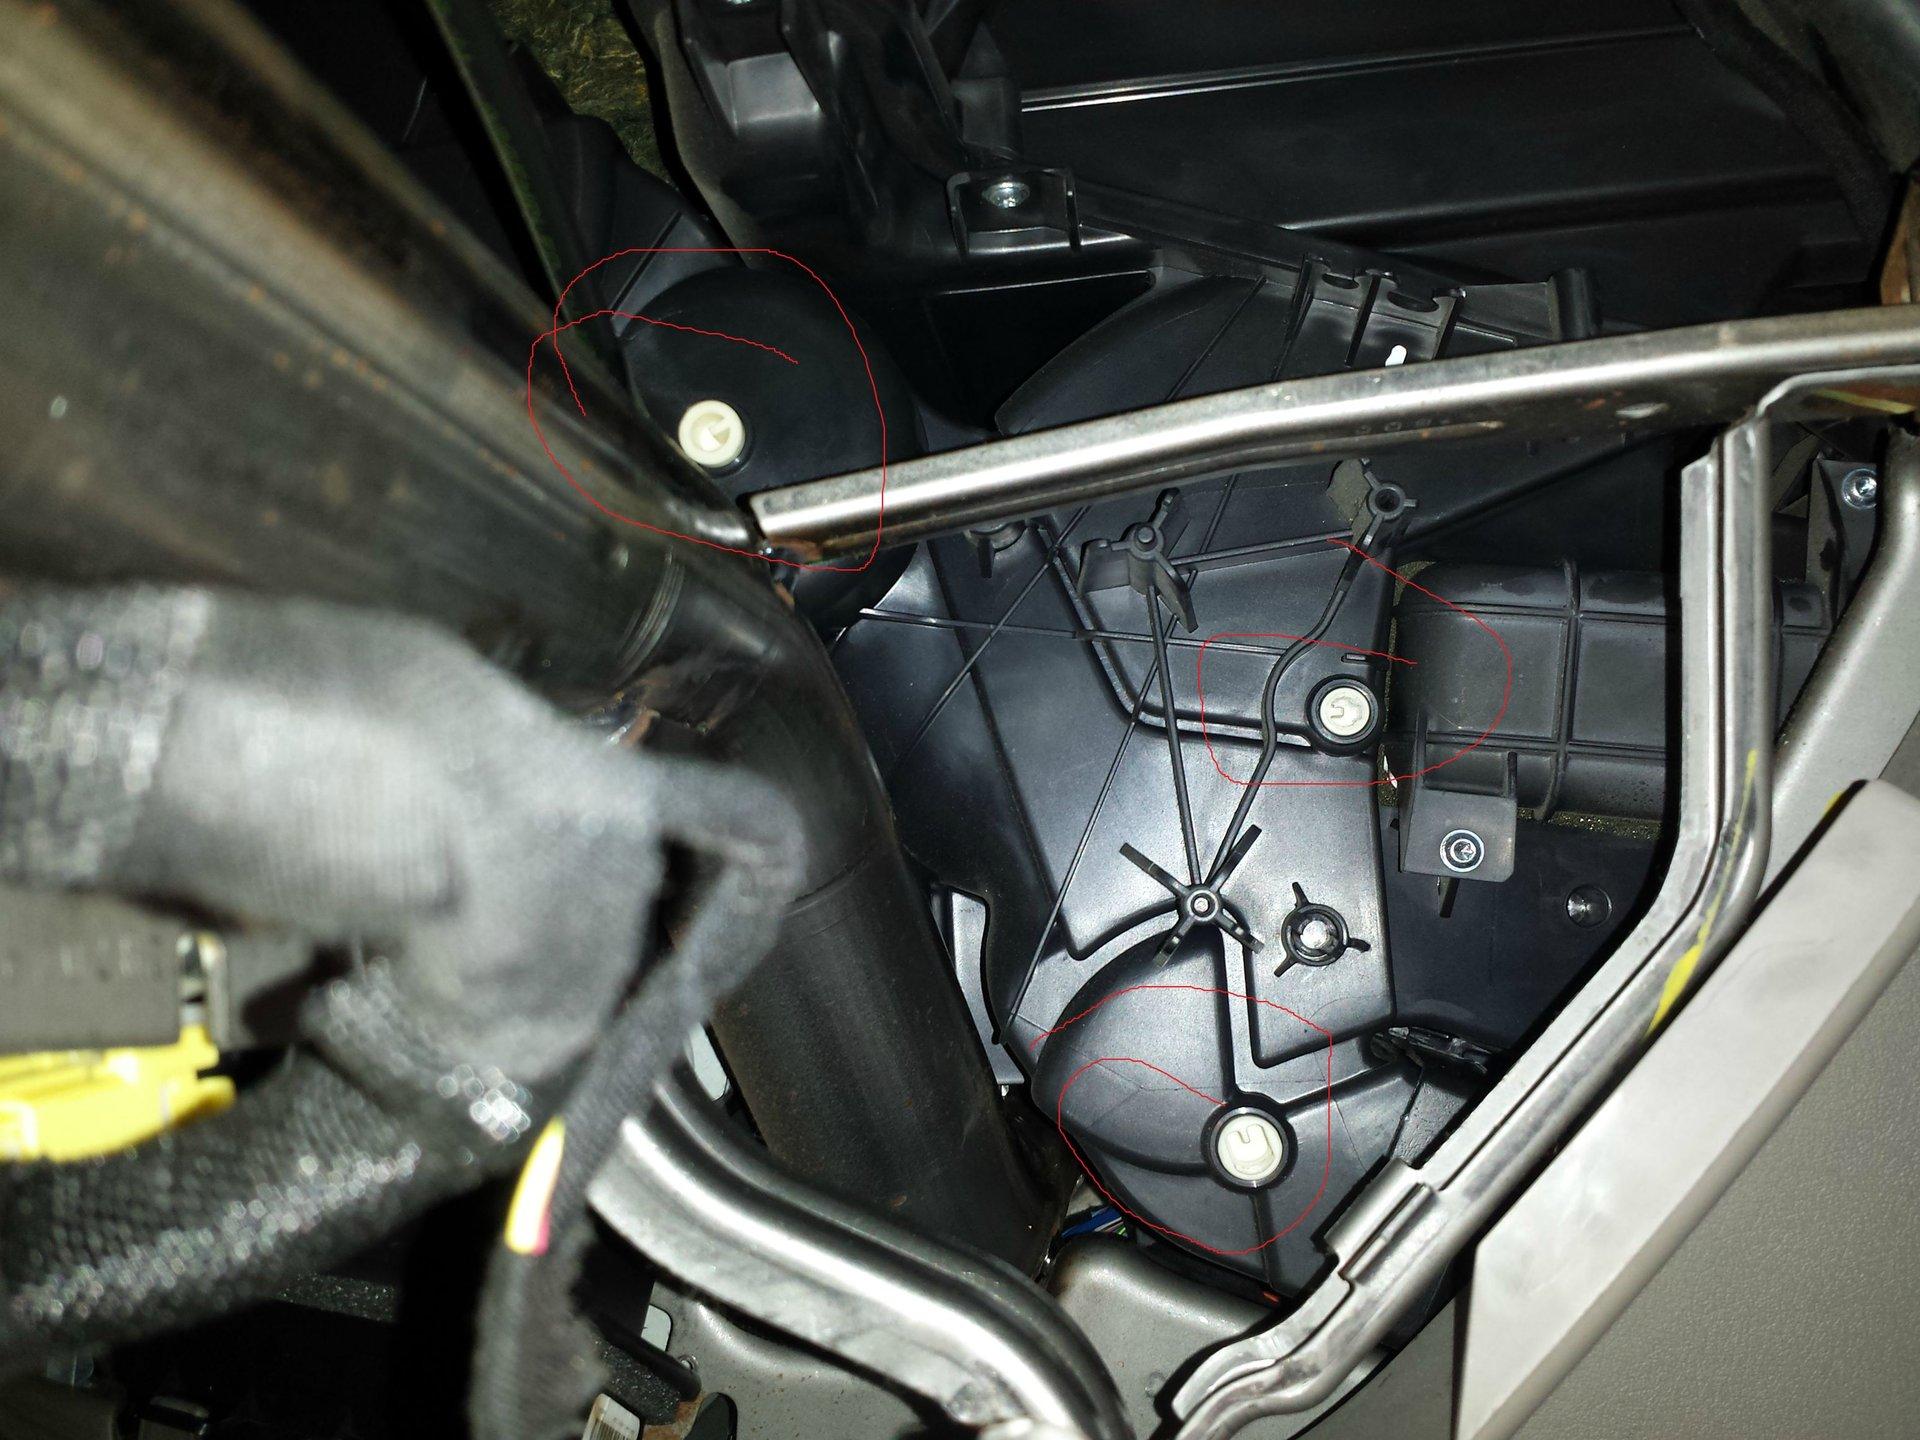 2005 Jeep grand cherokee 4 7 Weird air Conditioner Problem